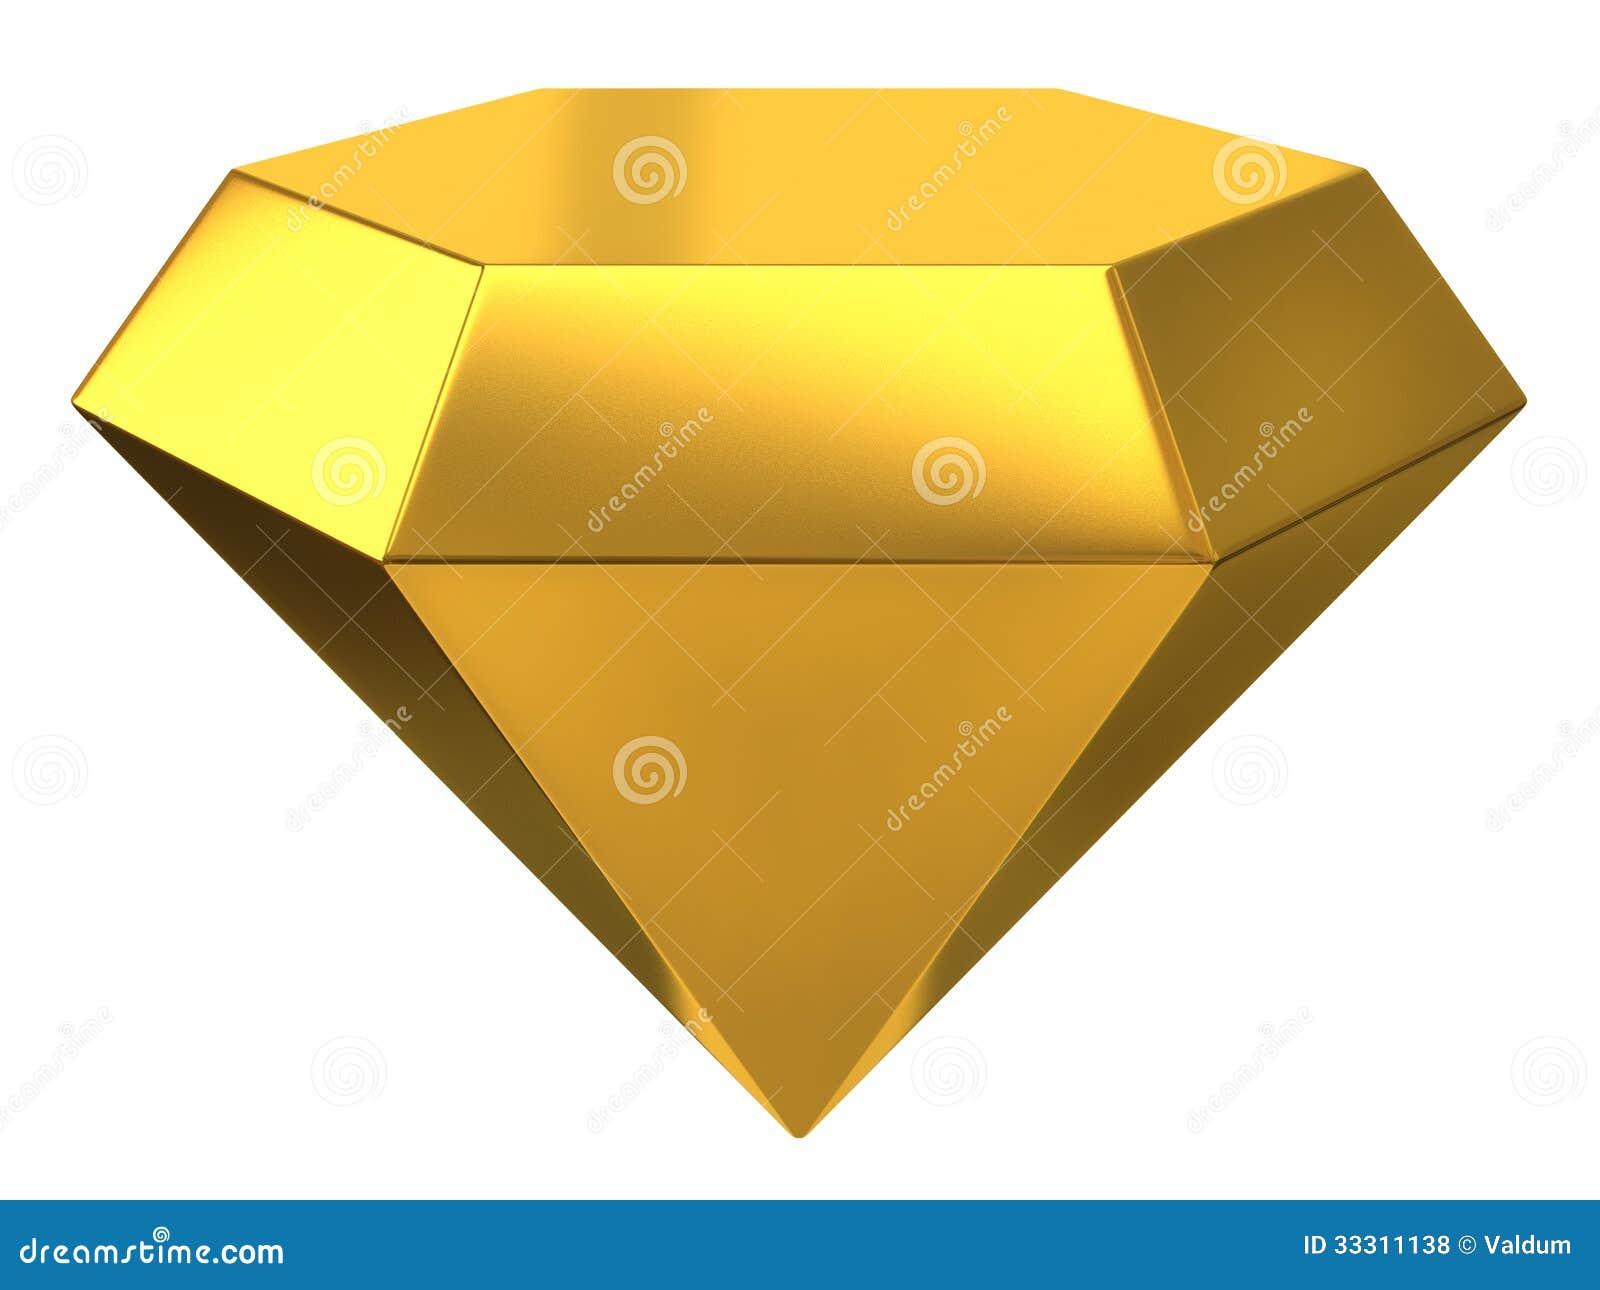 Illustration Of Gold Diamond Royalty Free Stock Photos